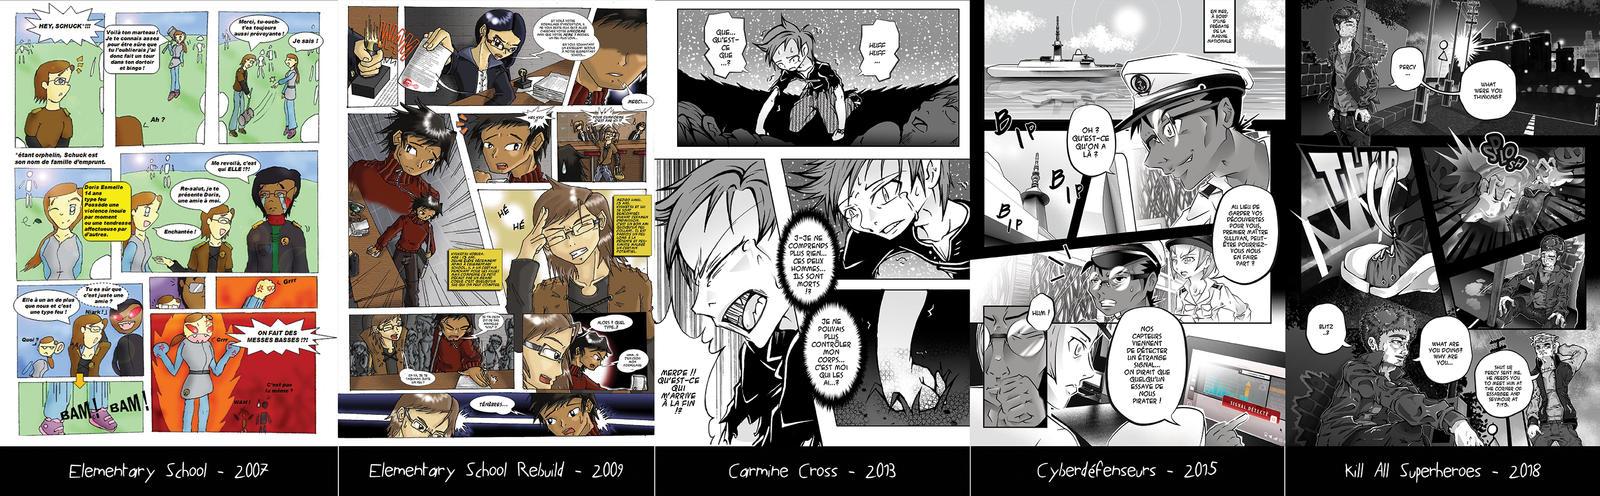 10 Years Of Comics by Mejiro-kun